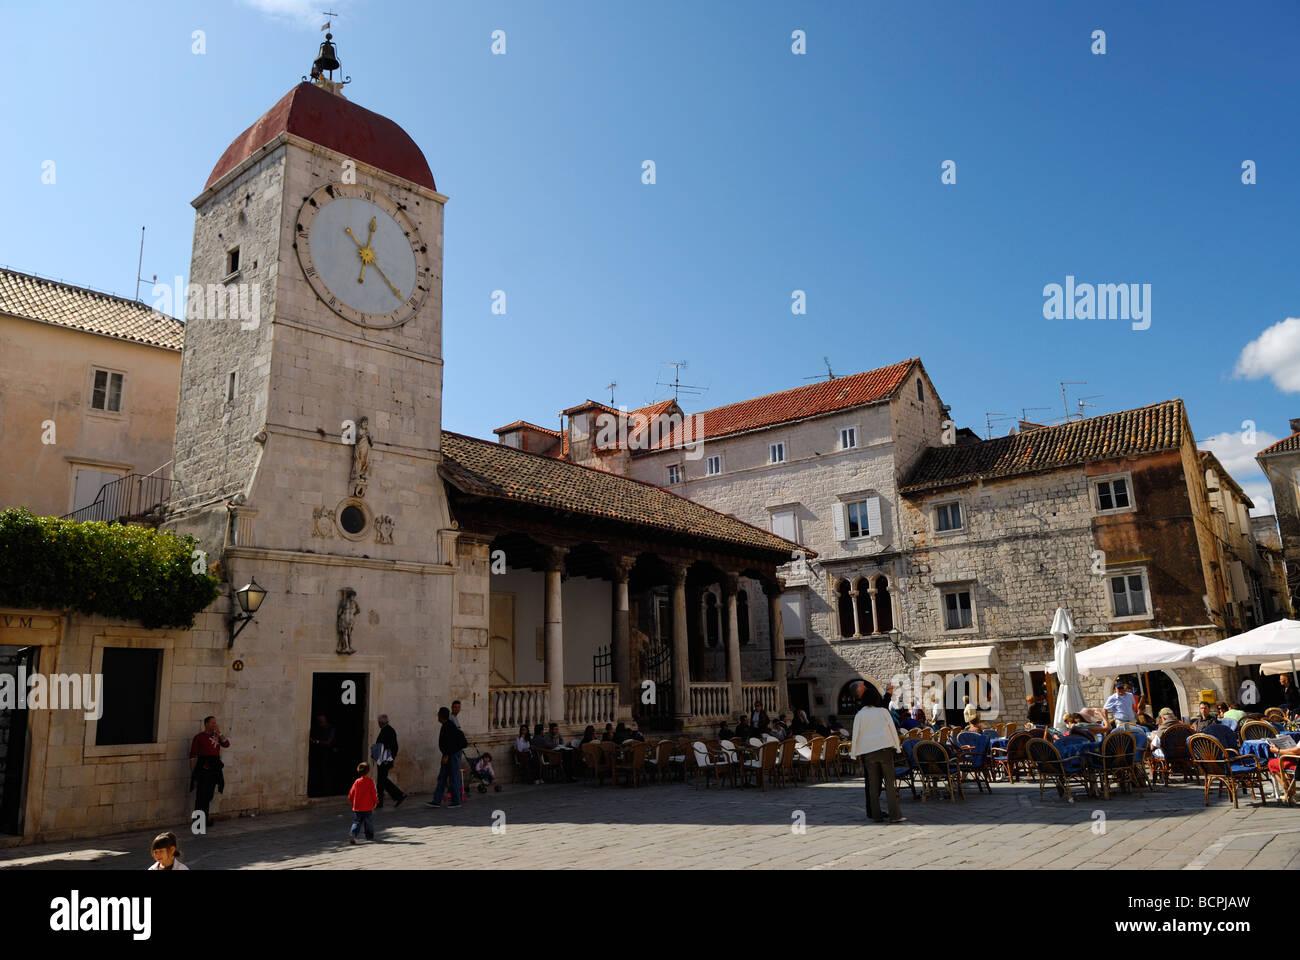 Loggia and Clock Tower at Trogir on Dalmatian Coast of Croatia - Stock Image